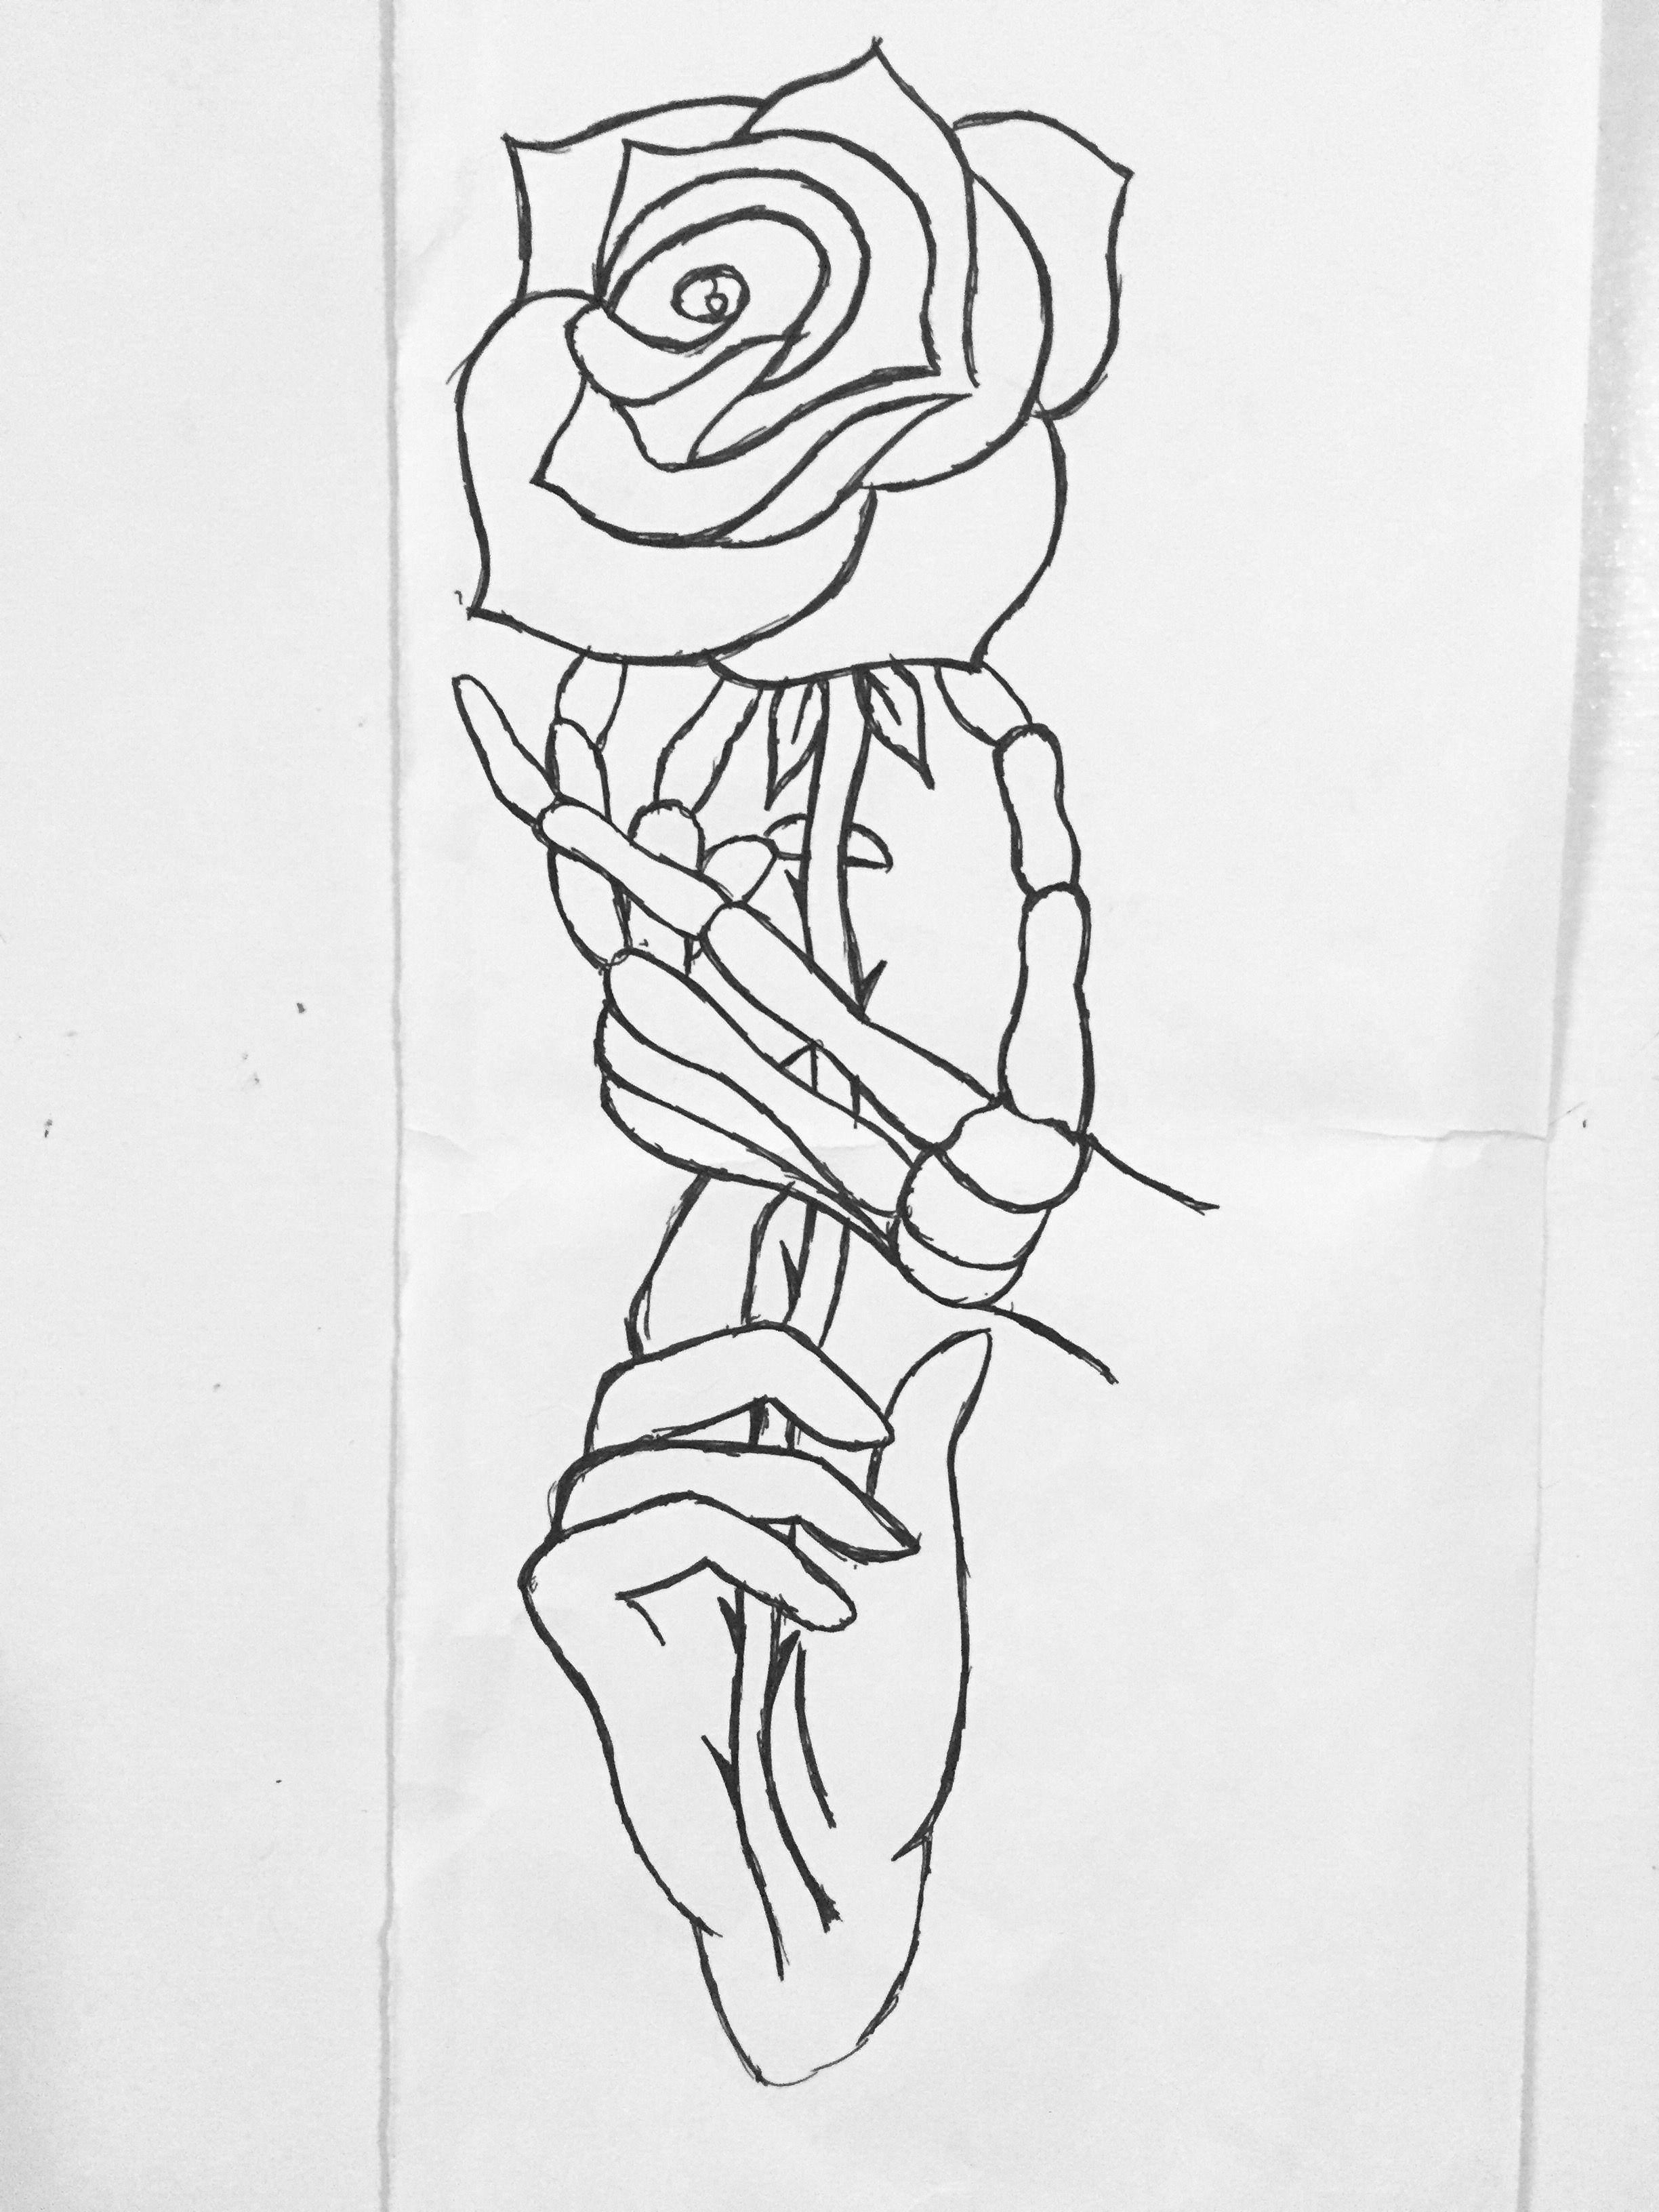 Hand Drawings Roses And Skulls: Skeleton Skull Hand Drawing Rose Tattoo Line Art Devil God